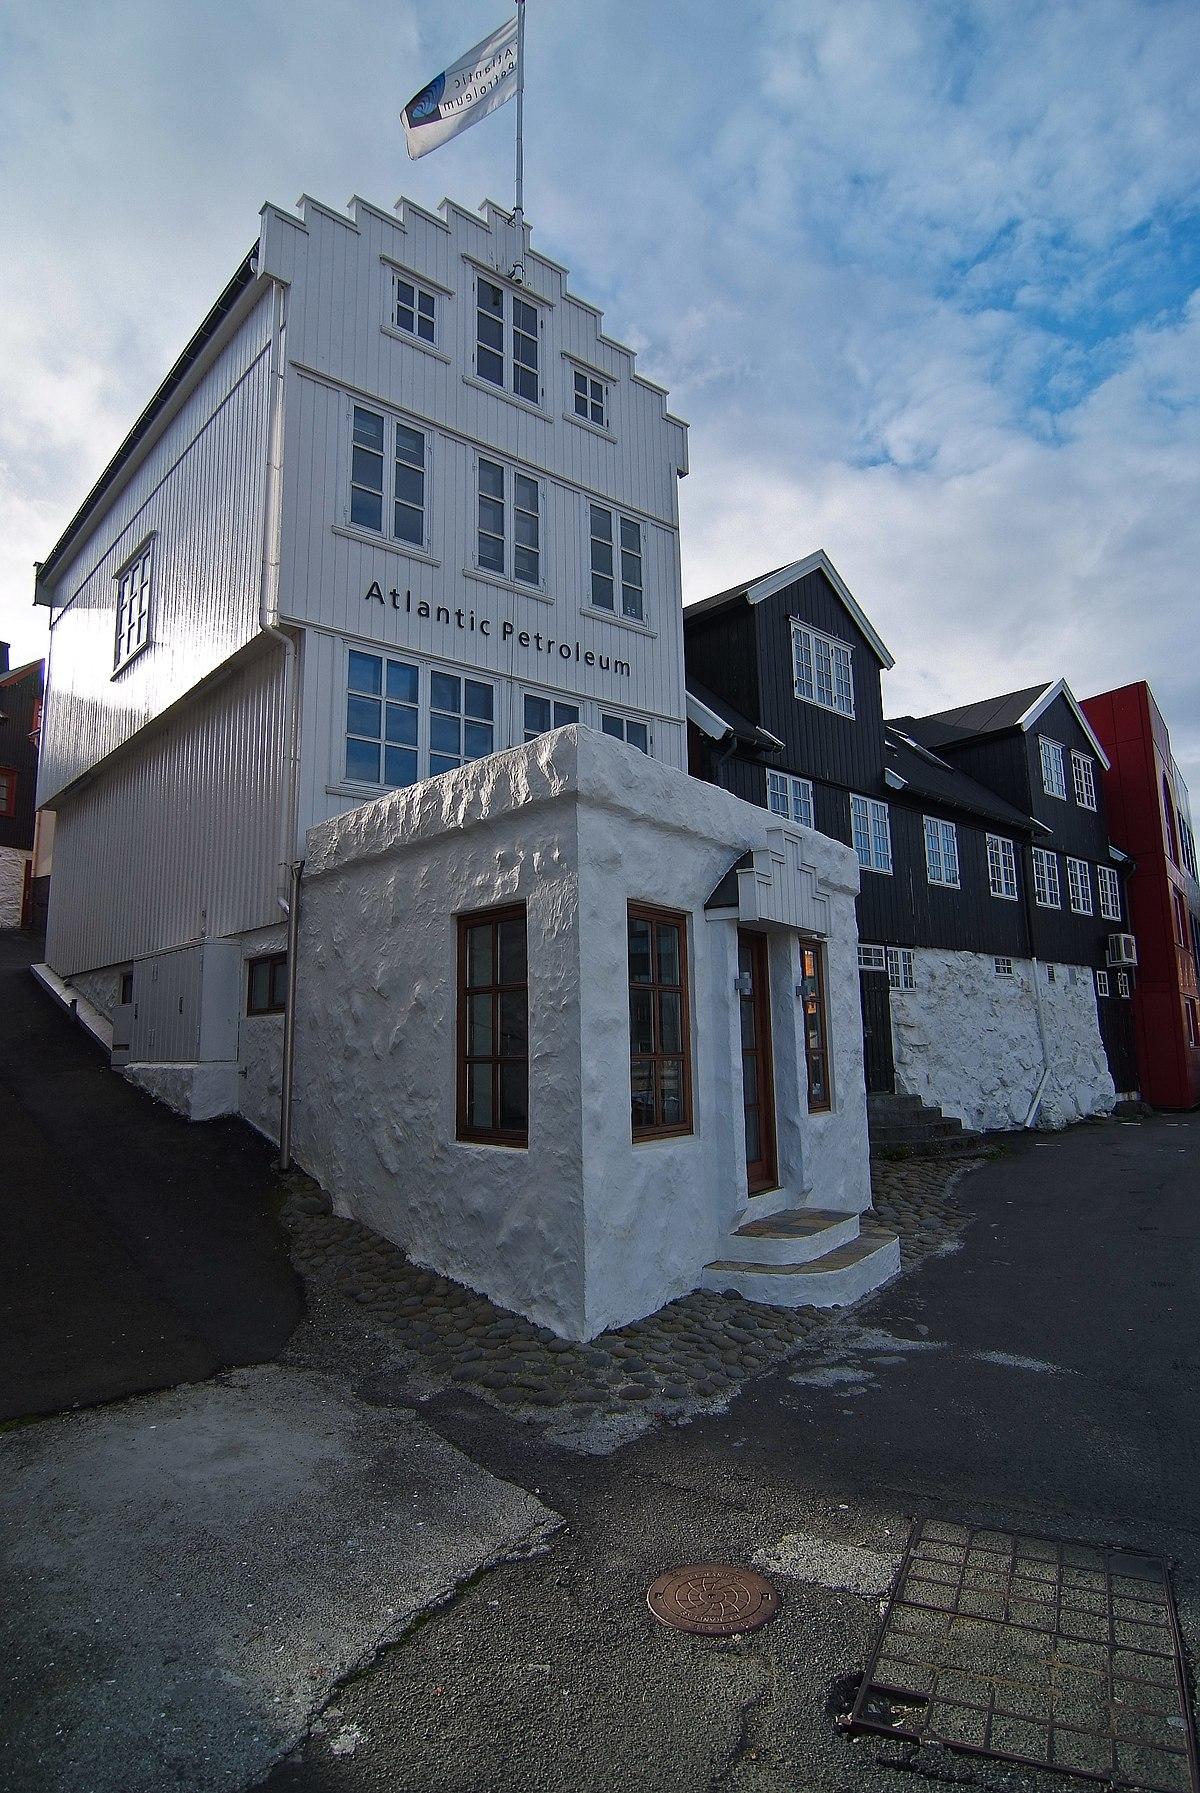 Atlantic Petroleum (Faroe Islands) - Wikipedia